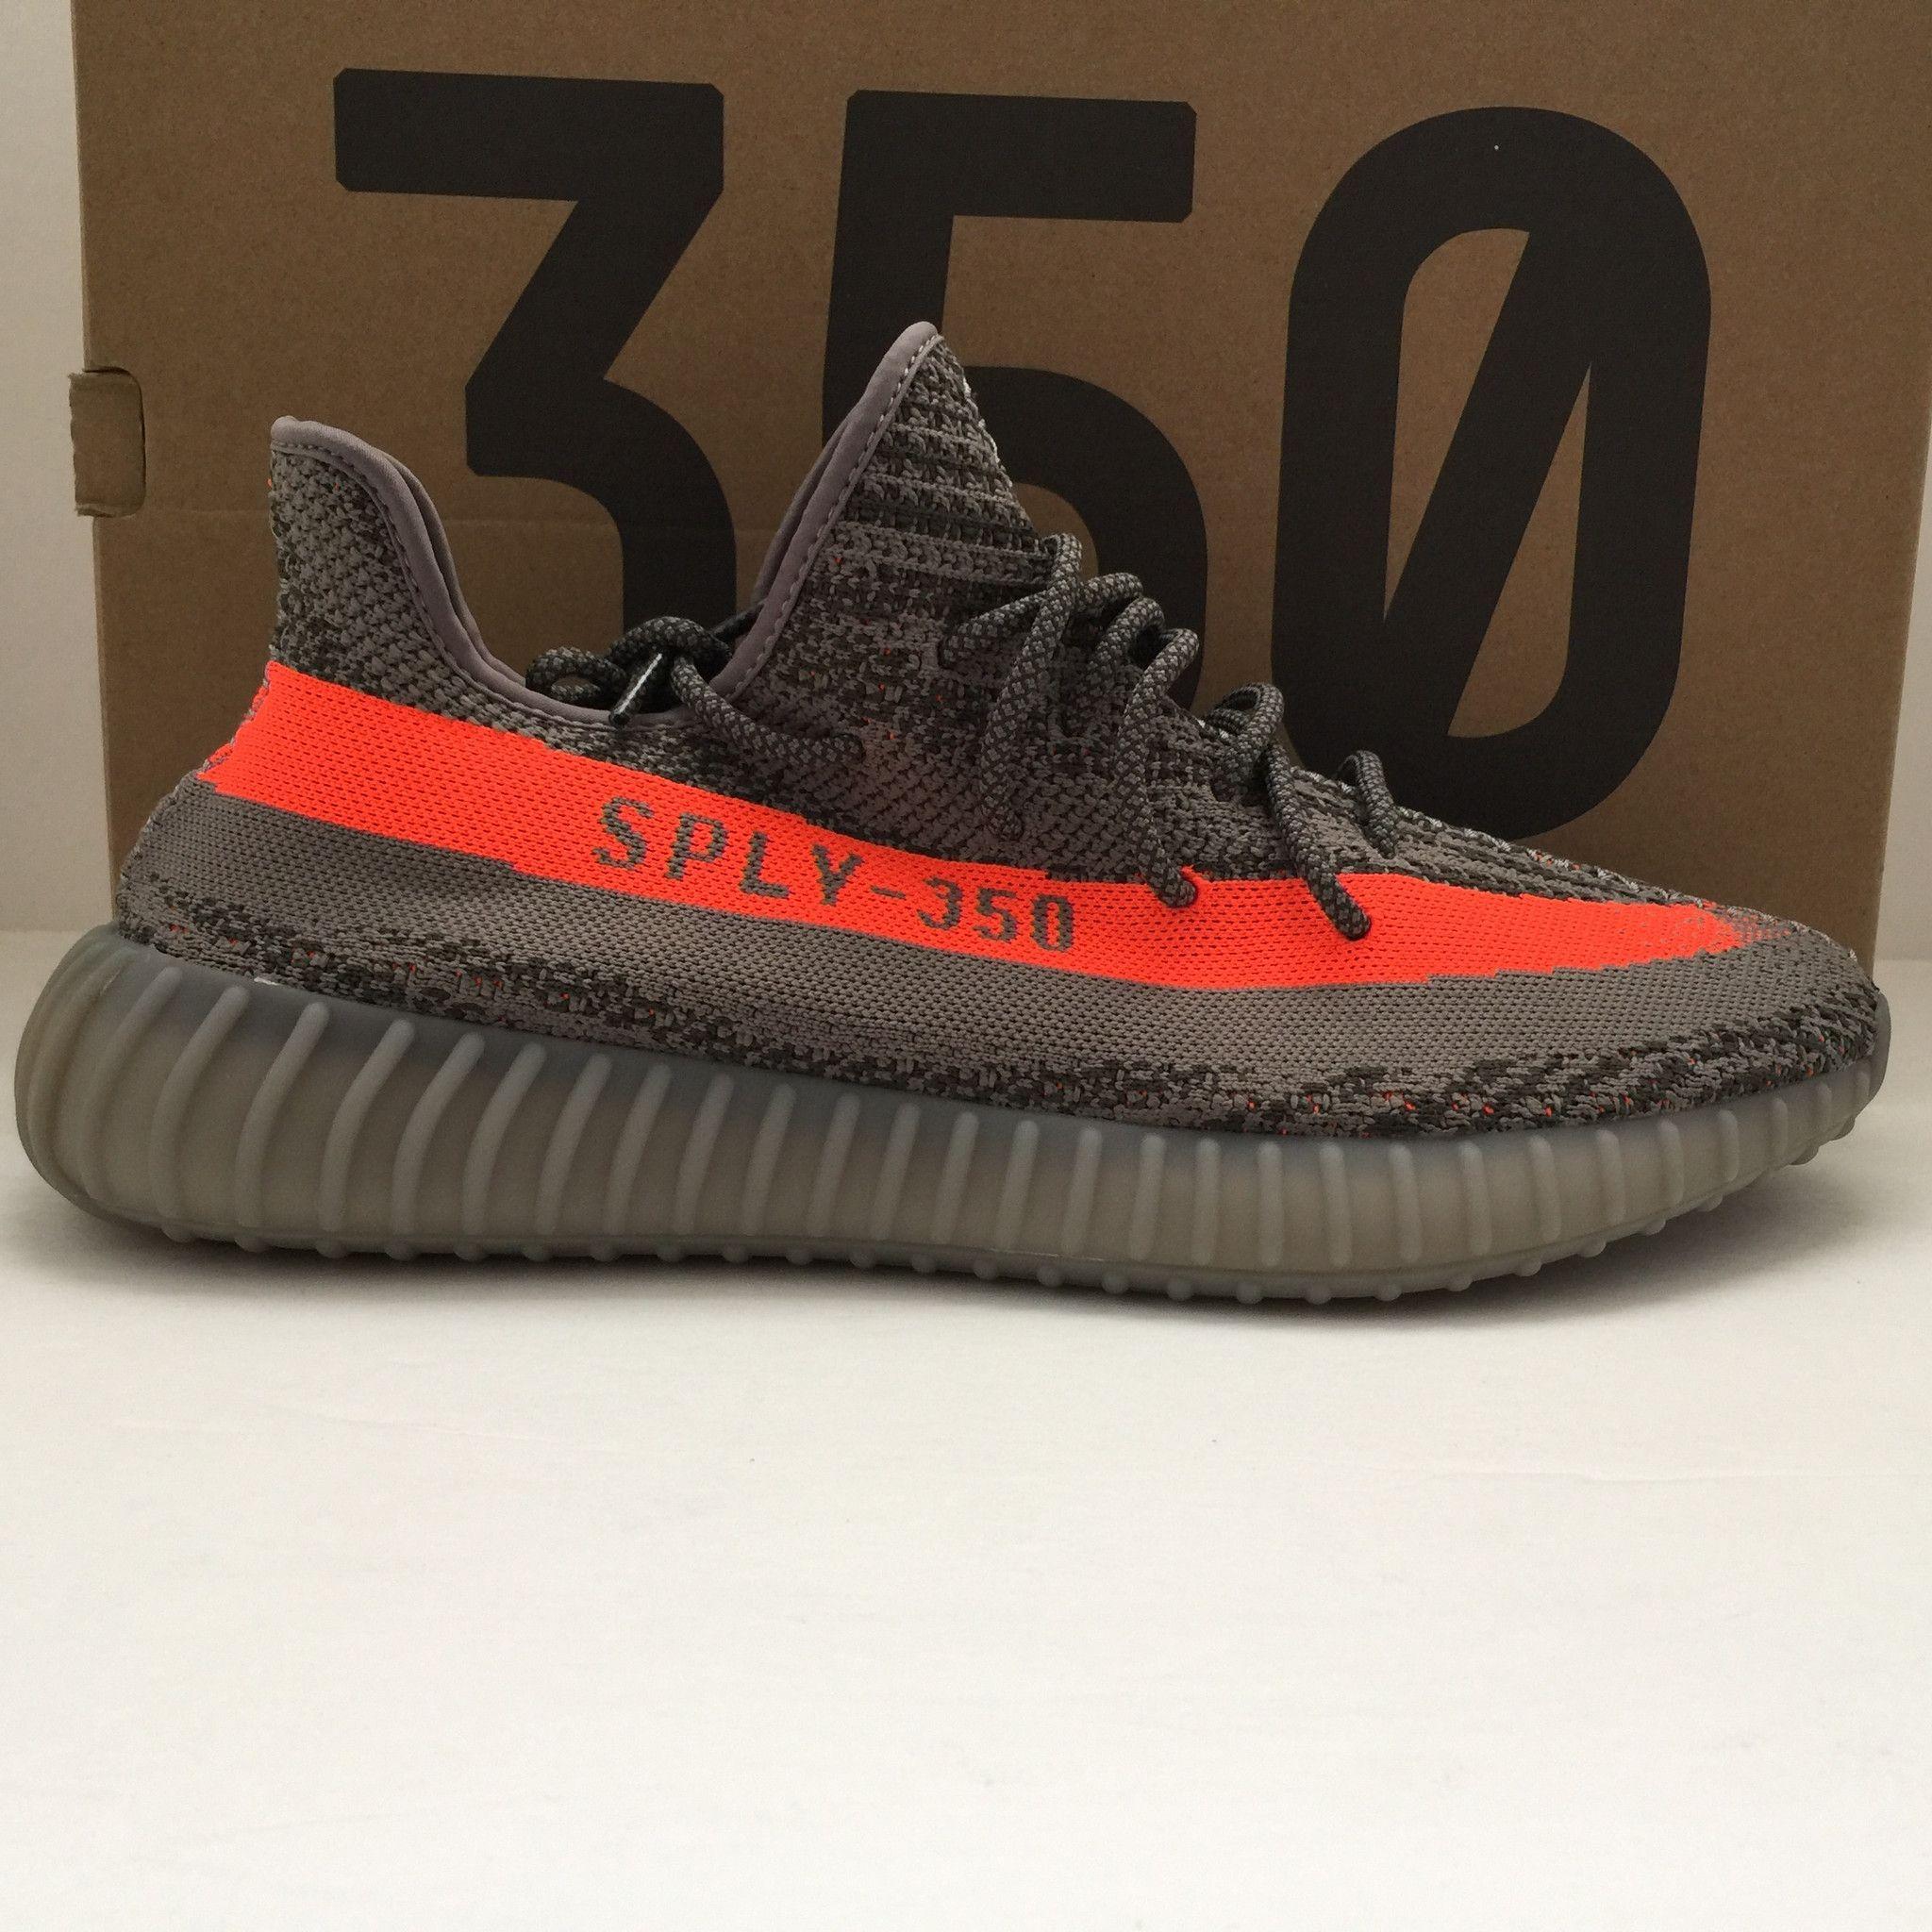 yeezy boost 950 size 14 yeezy boost adidas shop